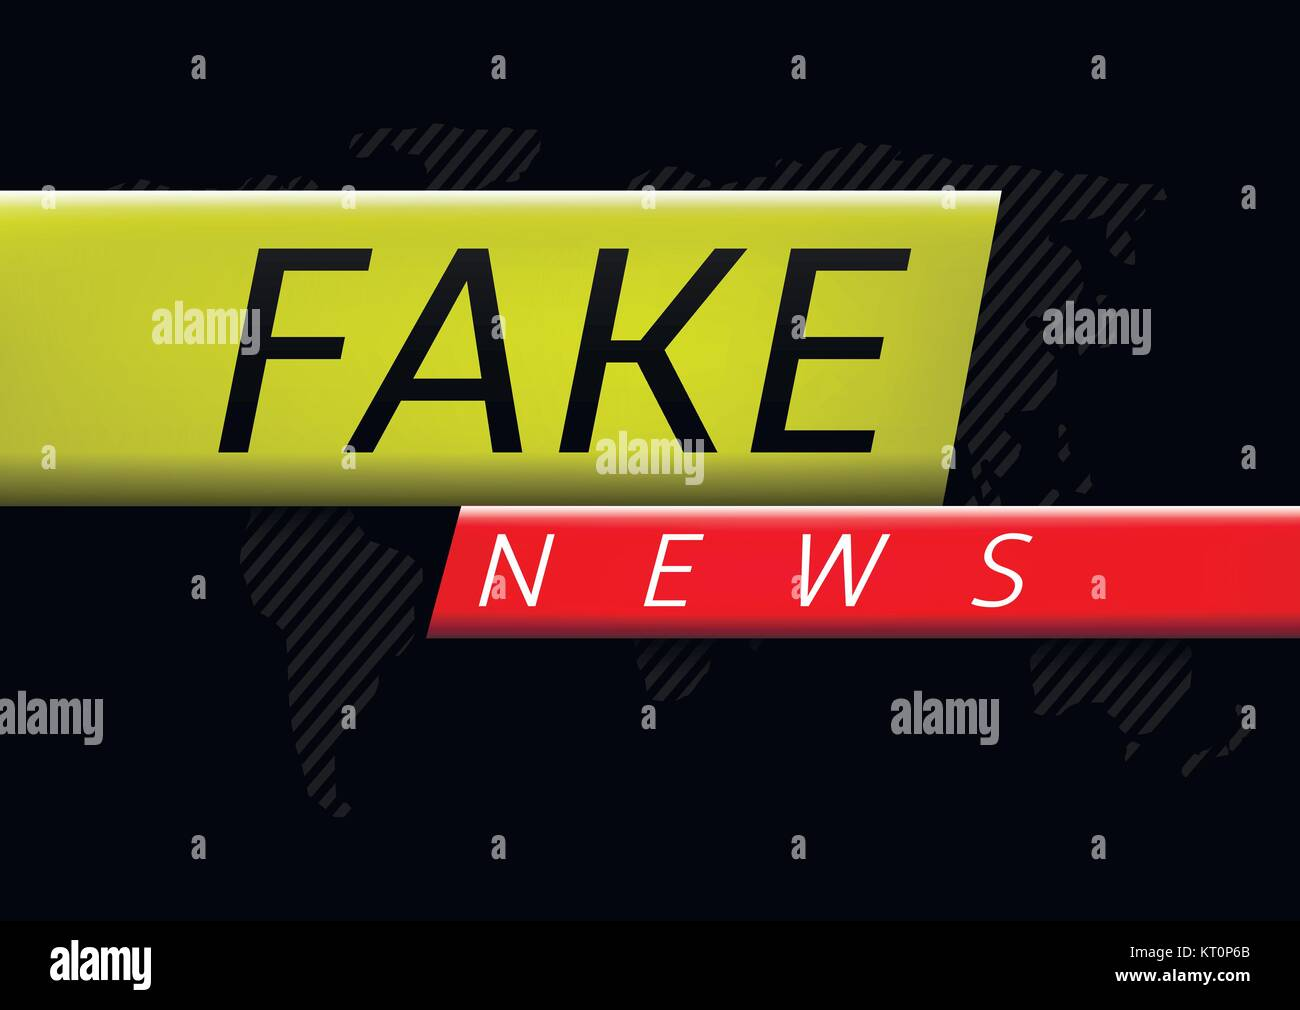 Fake news illustration - Stock Image